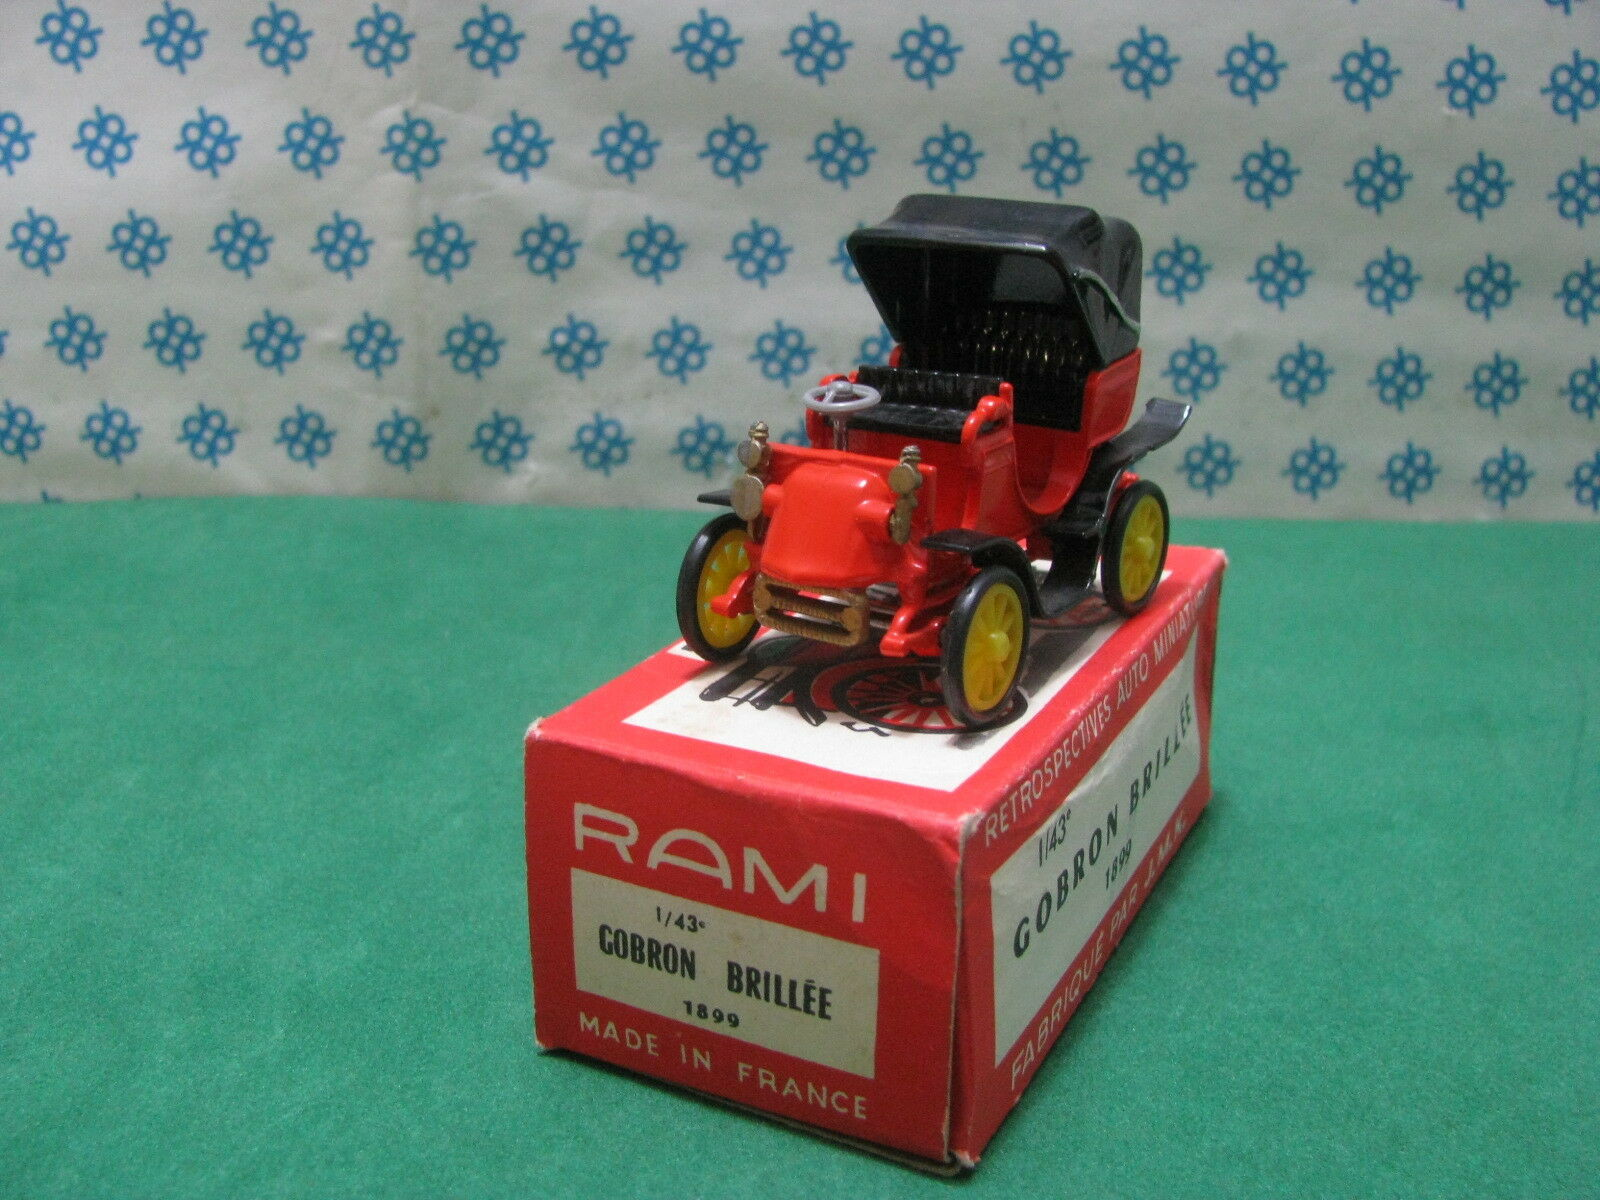 Vintage rami-Gobron brillèe 1899 - 1 43 france 1961